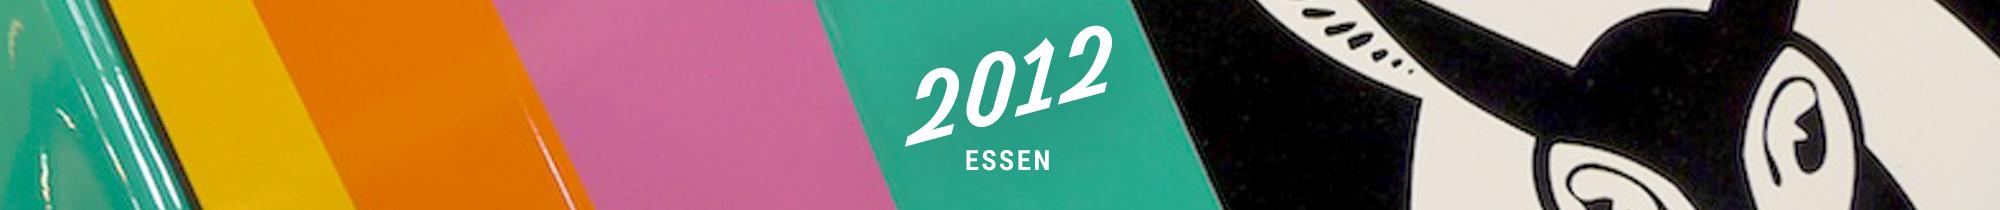 2012-essen-slidi-01